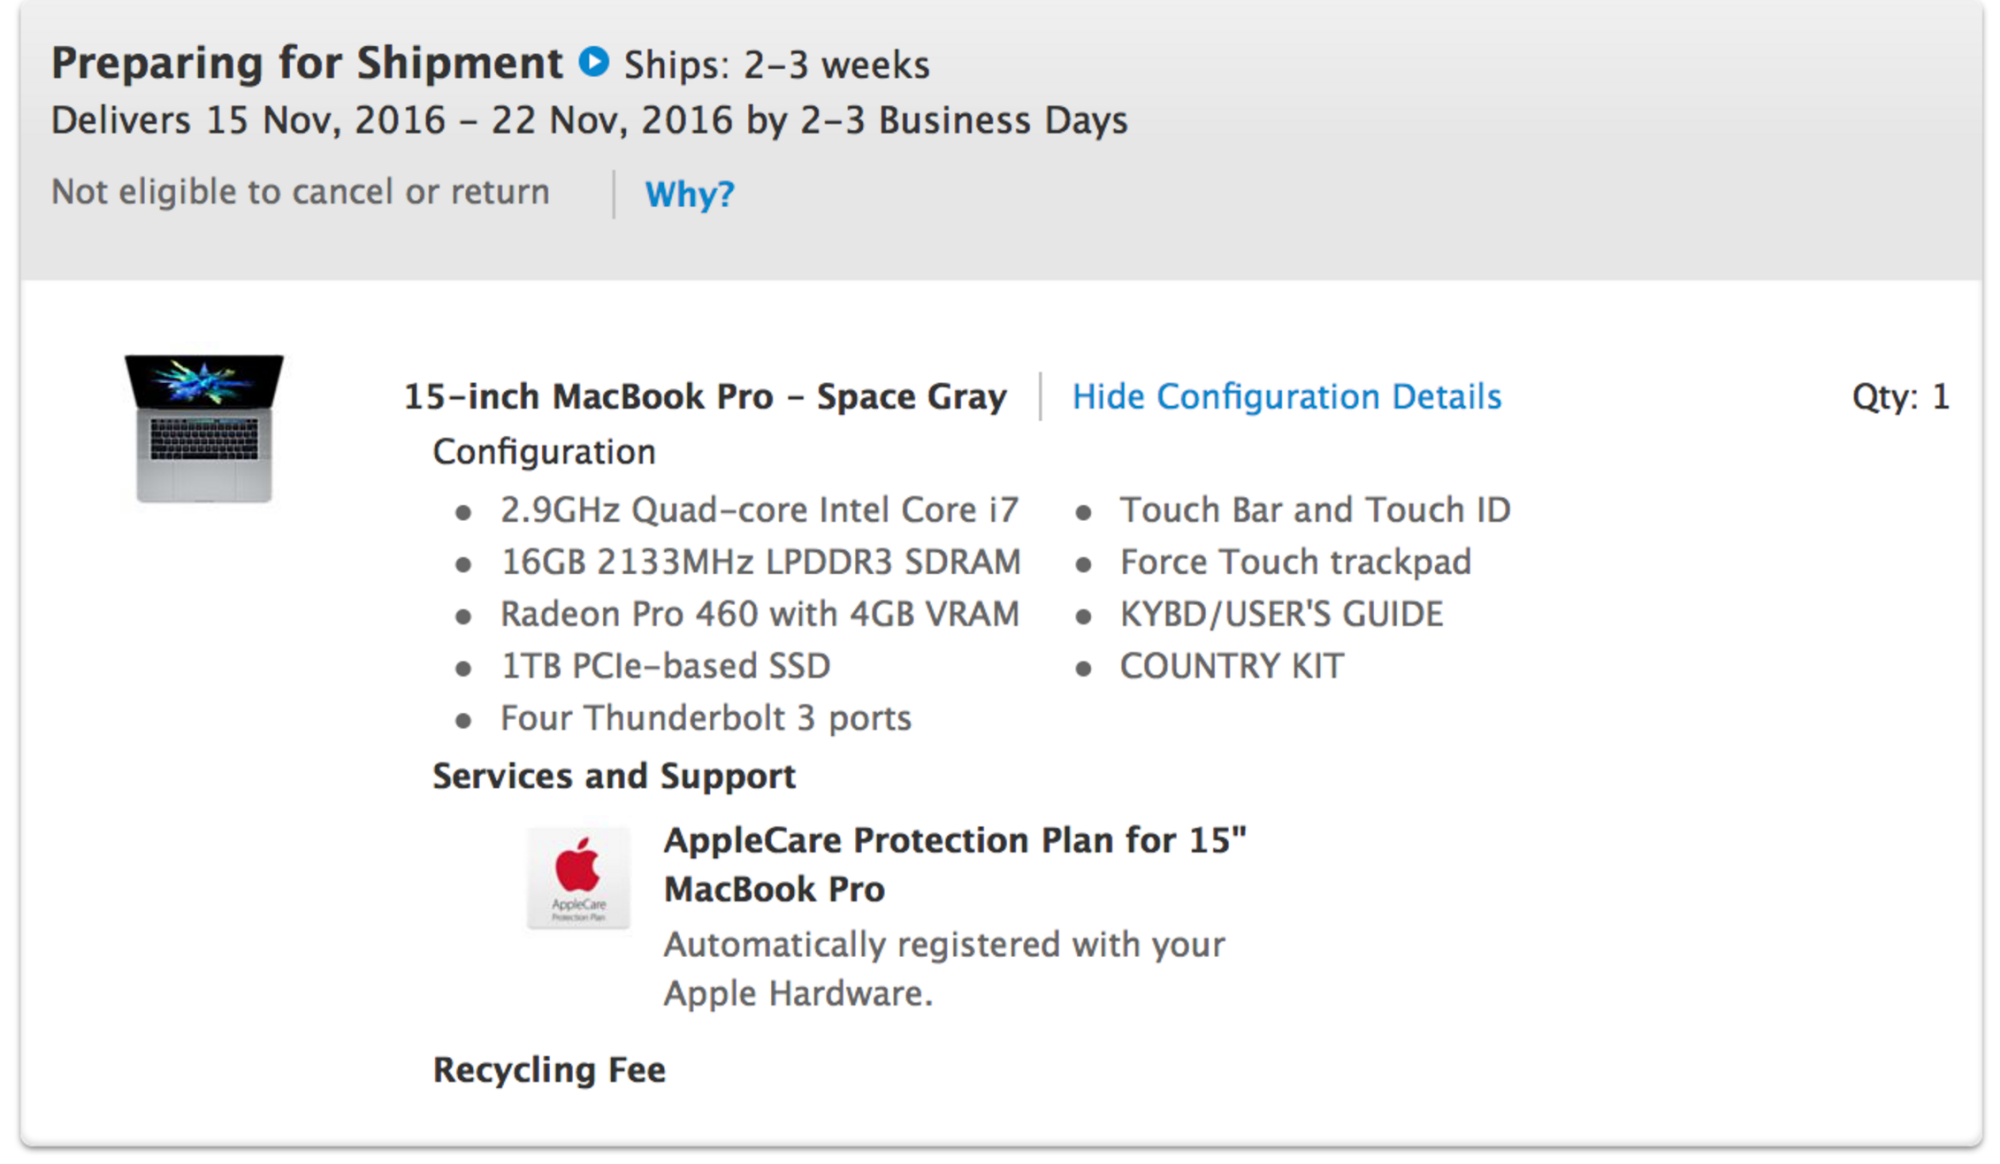 macbookpro-shipment1